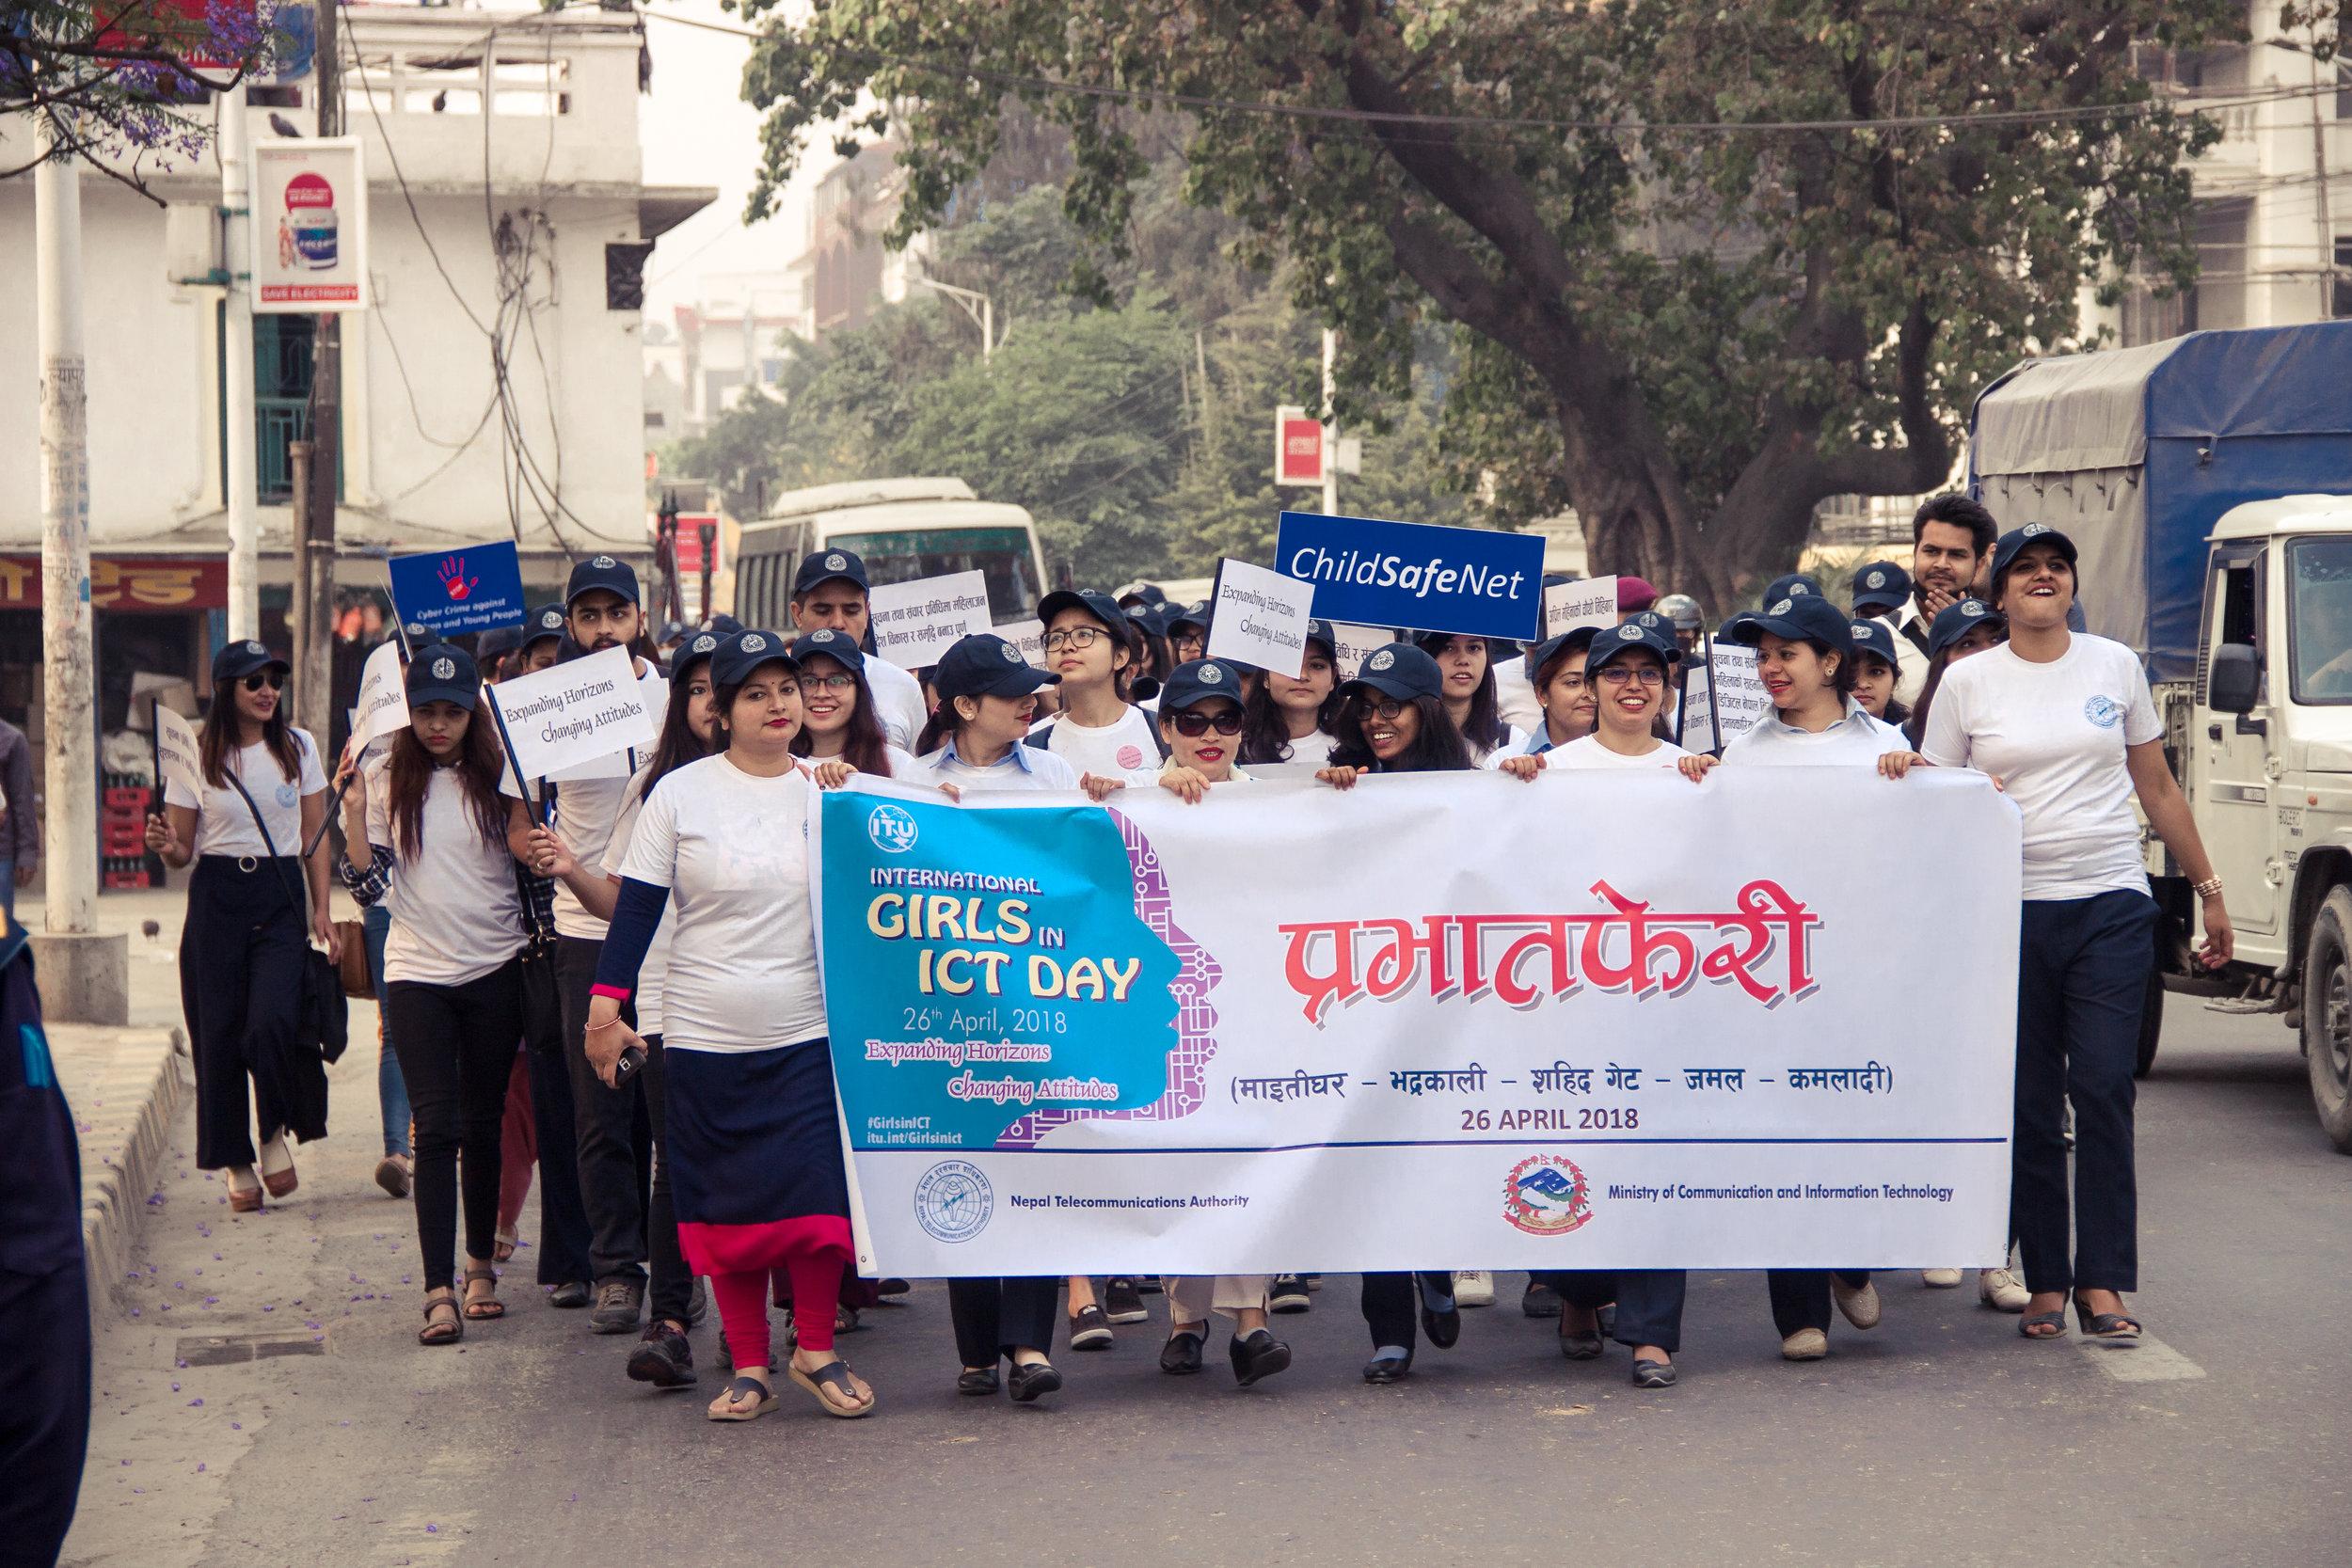 International Girls in ICT Day 2018